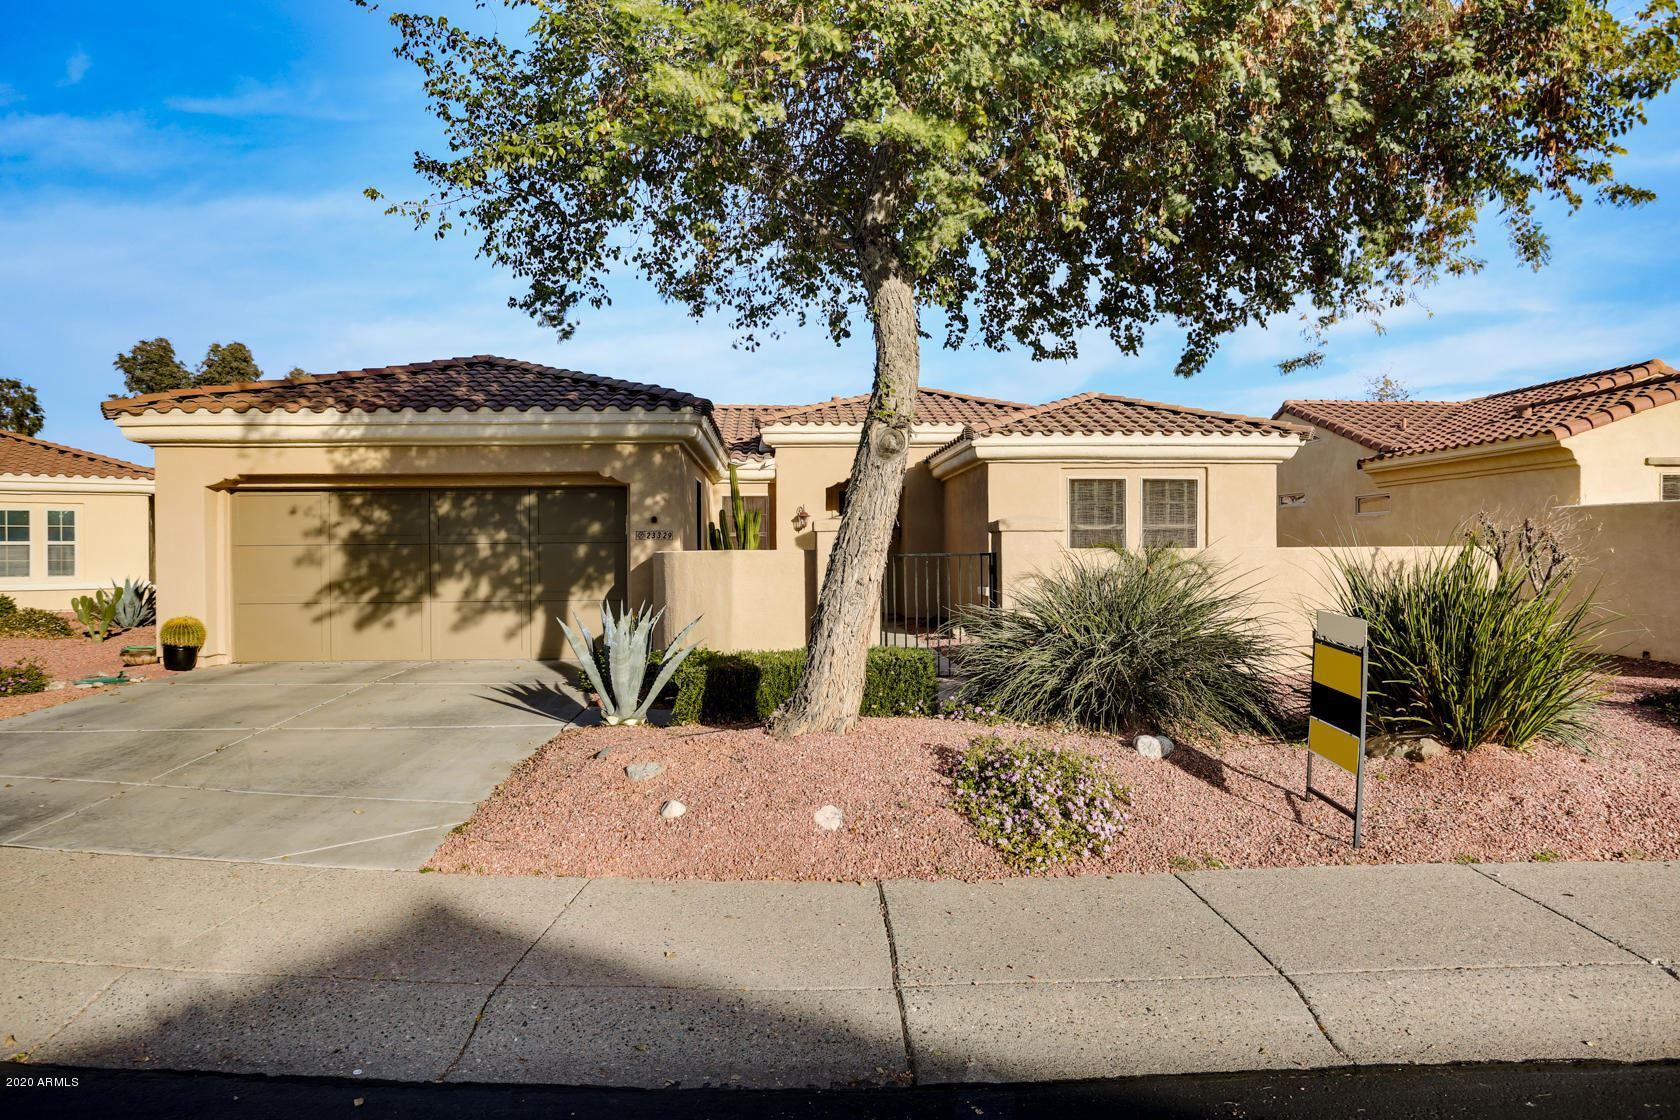 23329 N ARRELLAGA Drive, Sun City West, AZ 85375 - MLS#: 6032732